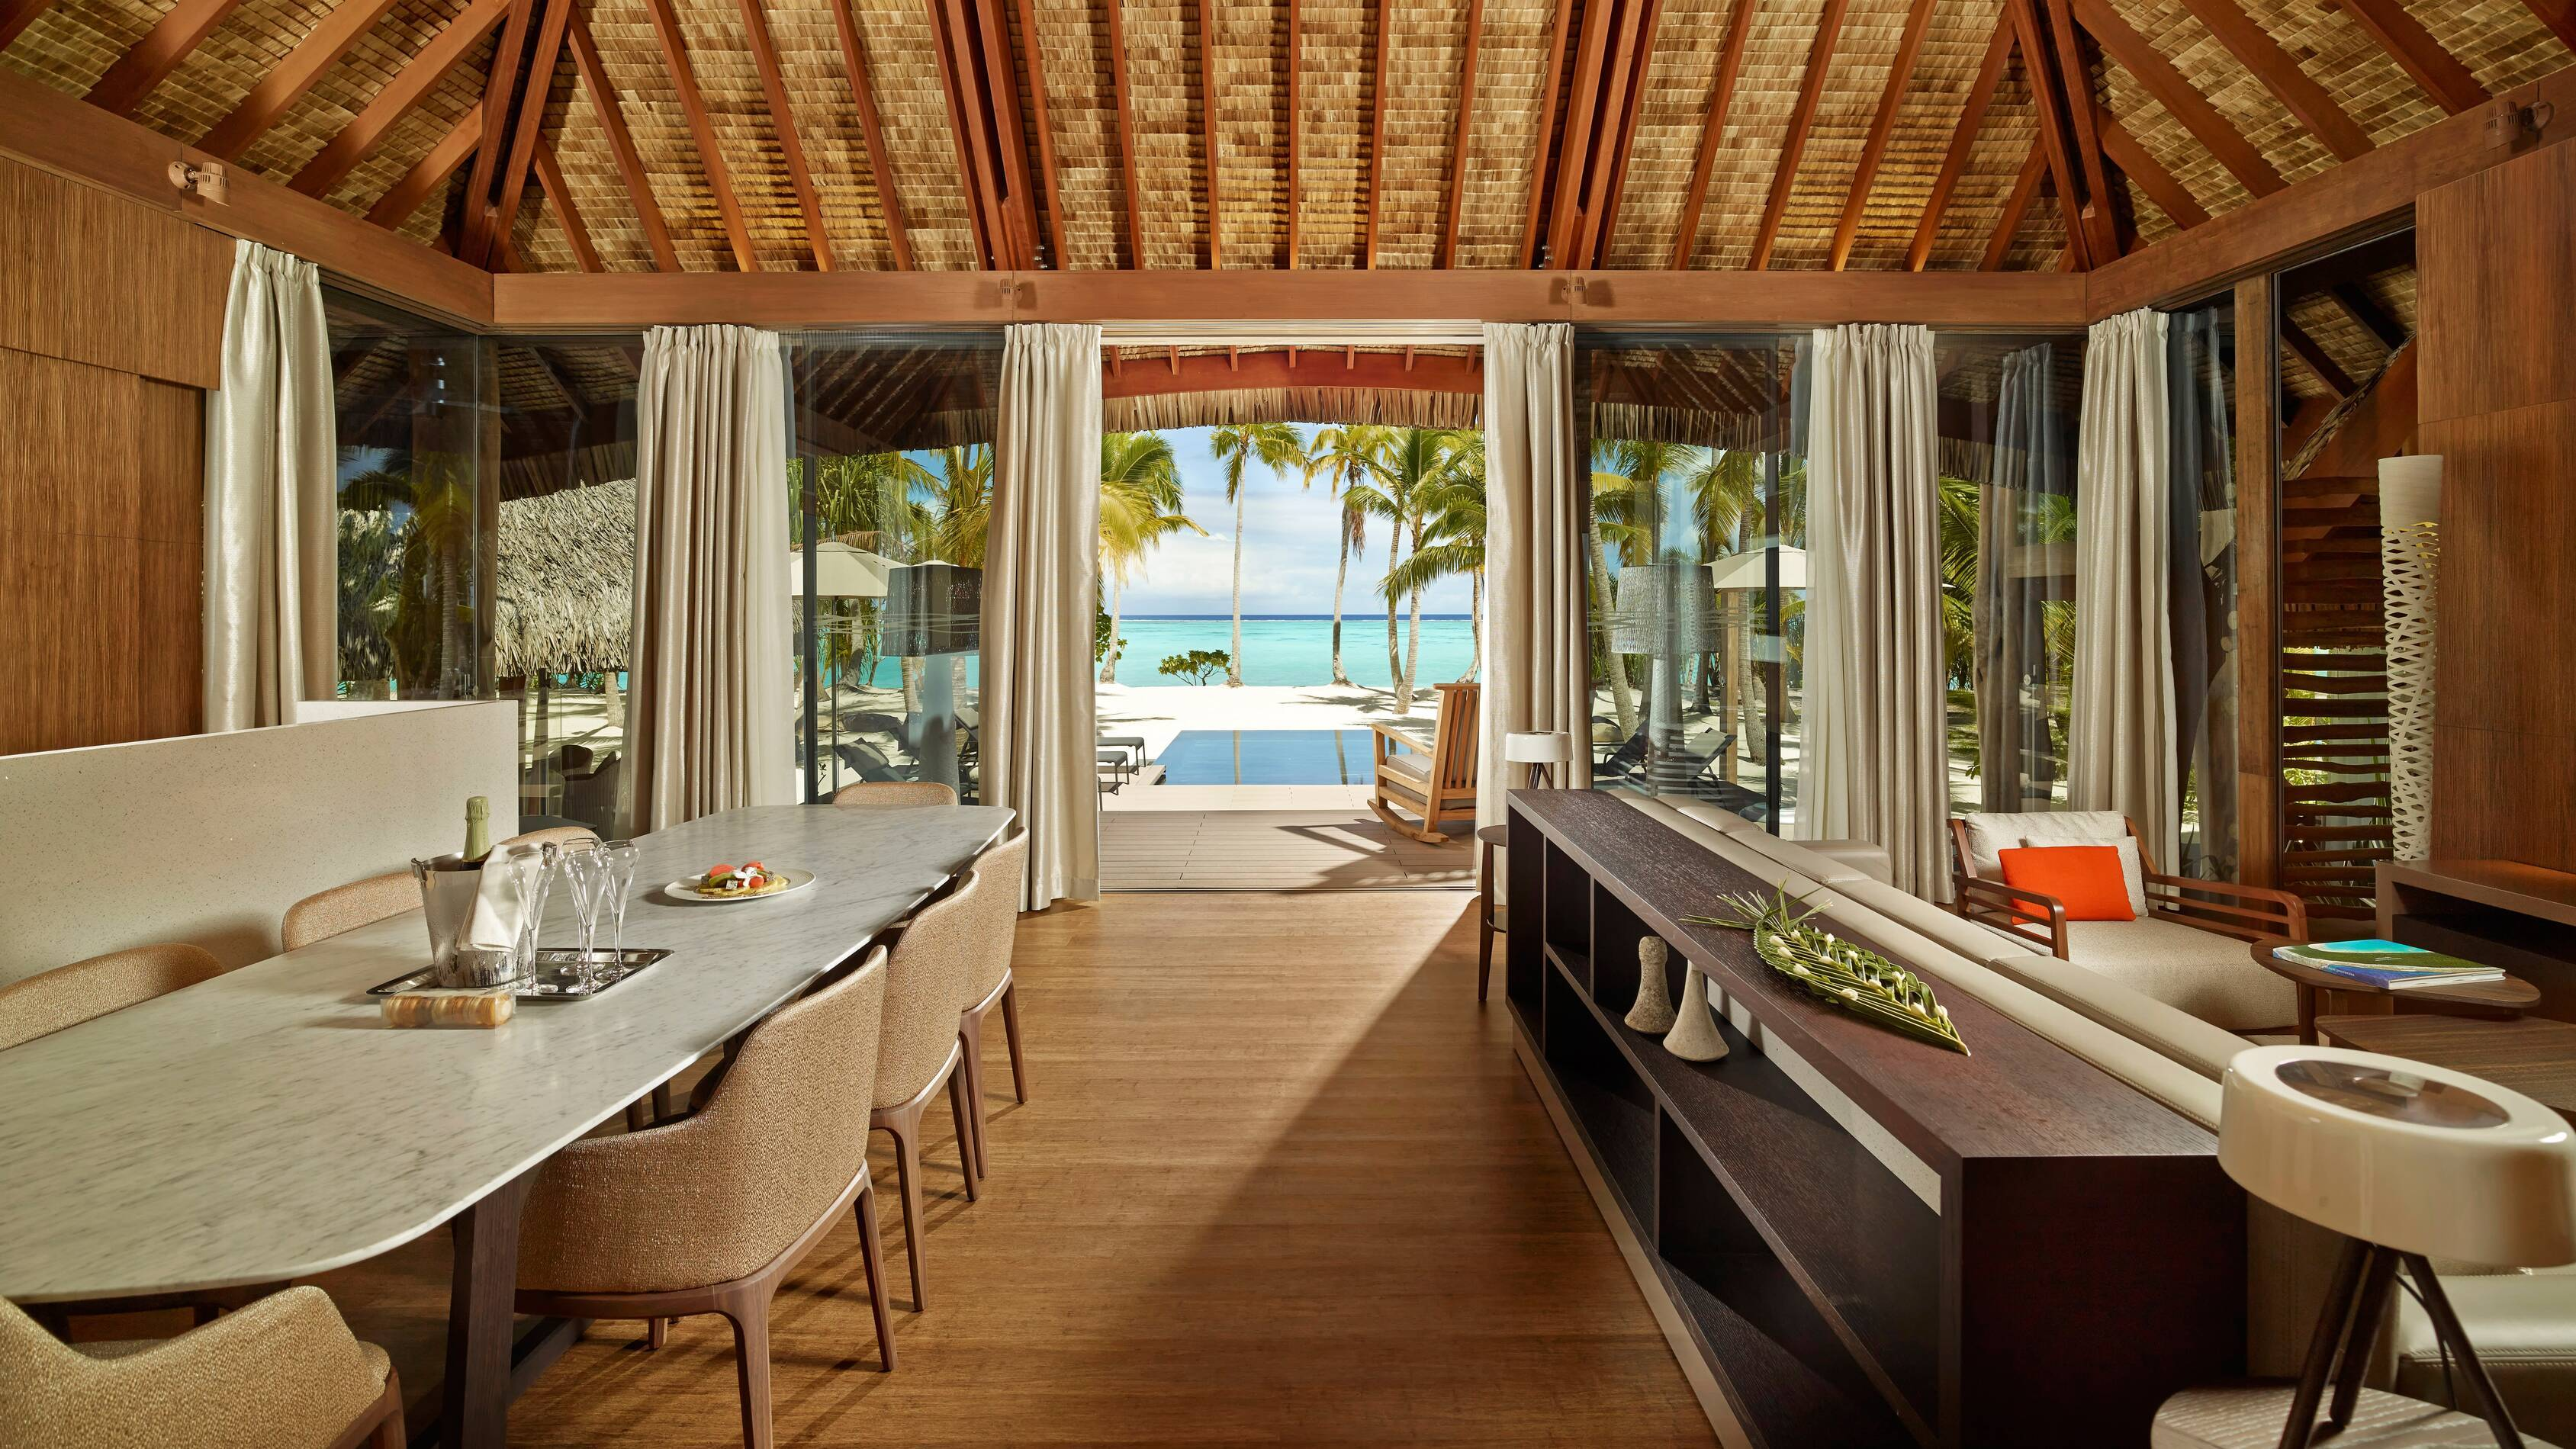 The Brando Villa 3 Chambres Salon Polynesie Tetiaroa